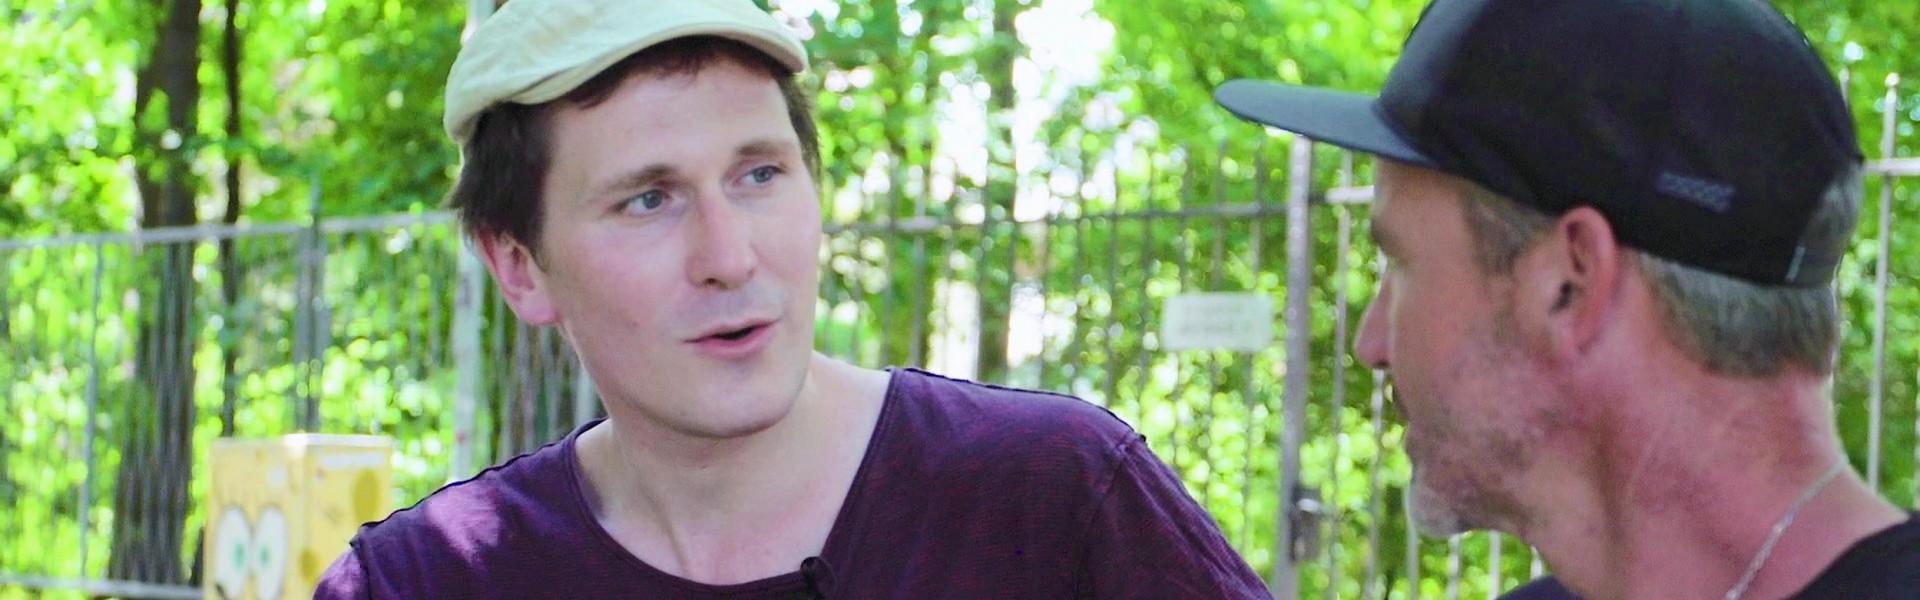 Kabarettist Hosea Ratschiller im Interview bei #Rotjacken-TV